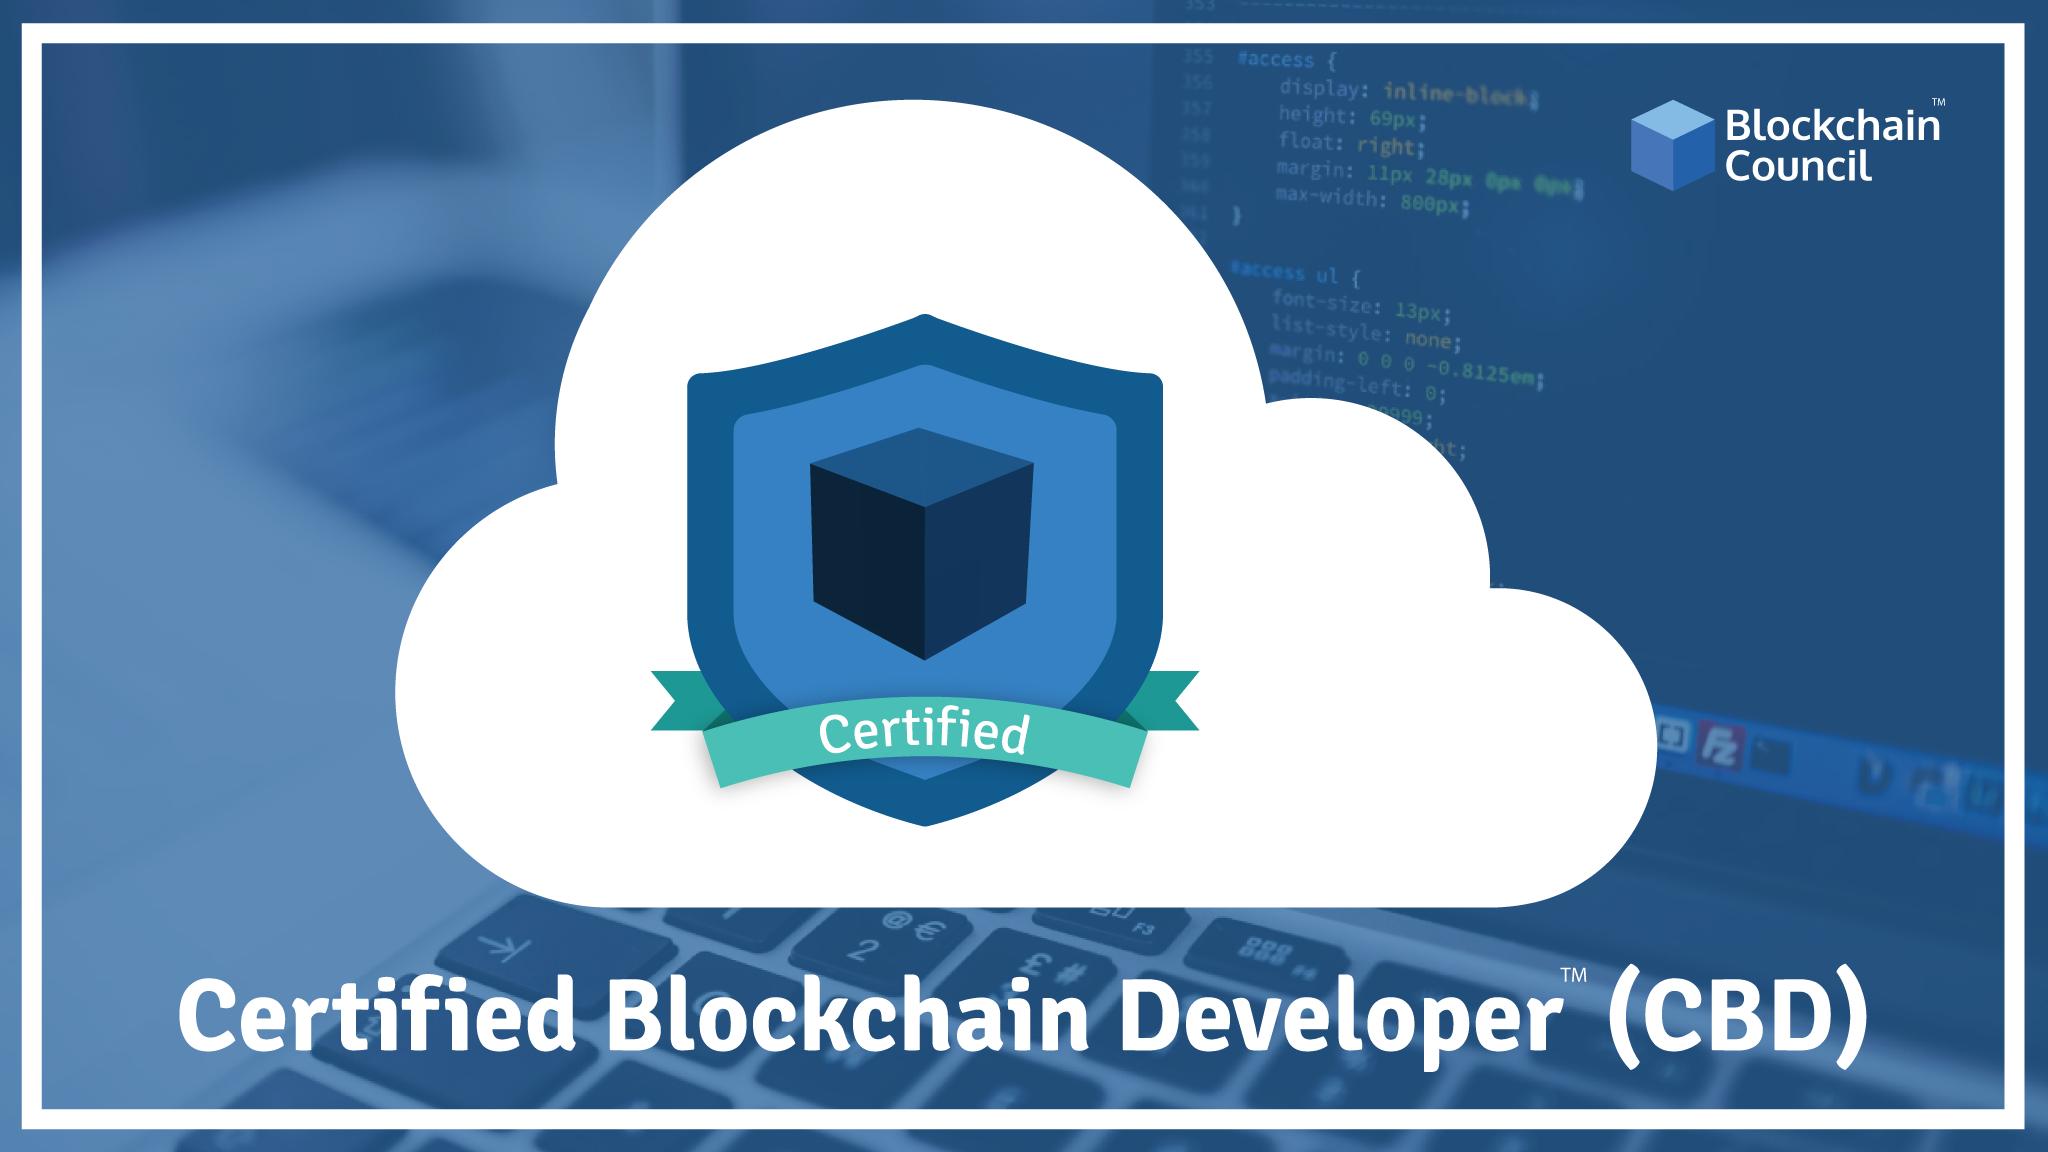 Certified Blockchain Developer™(CBD) Blockchain Council